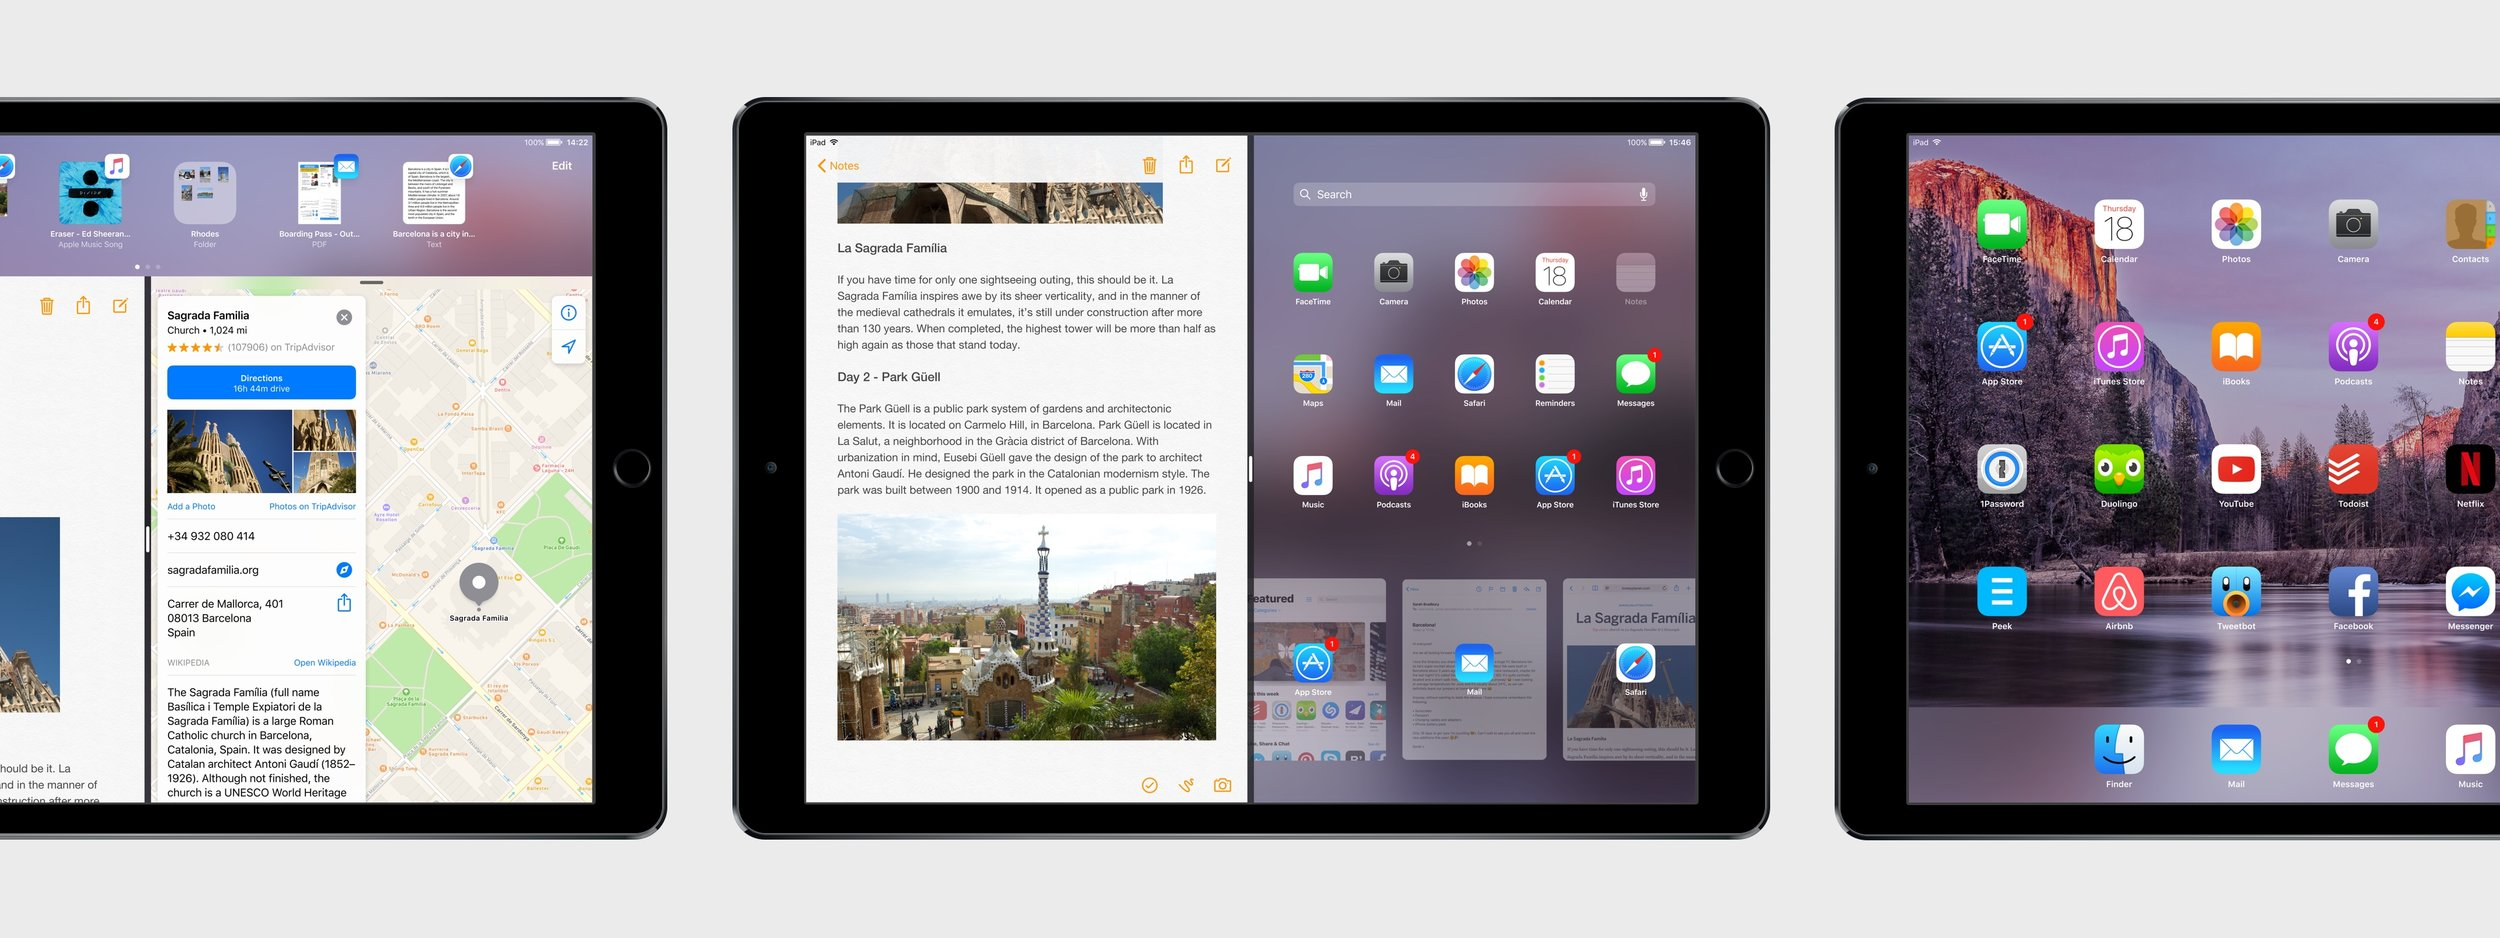 iOS 11 is Coming — Dan Merfeld